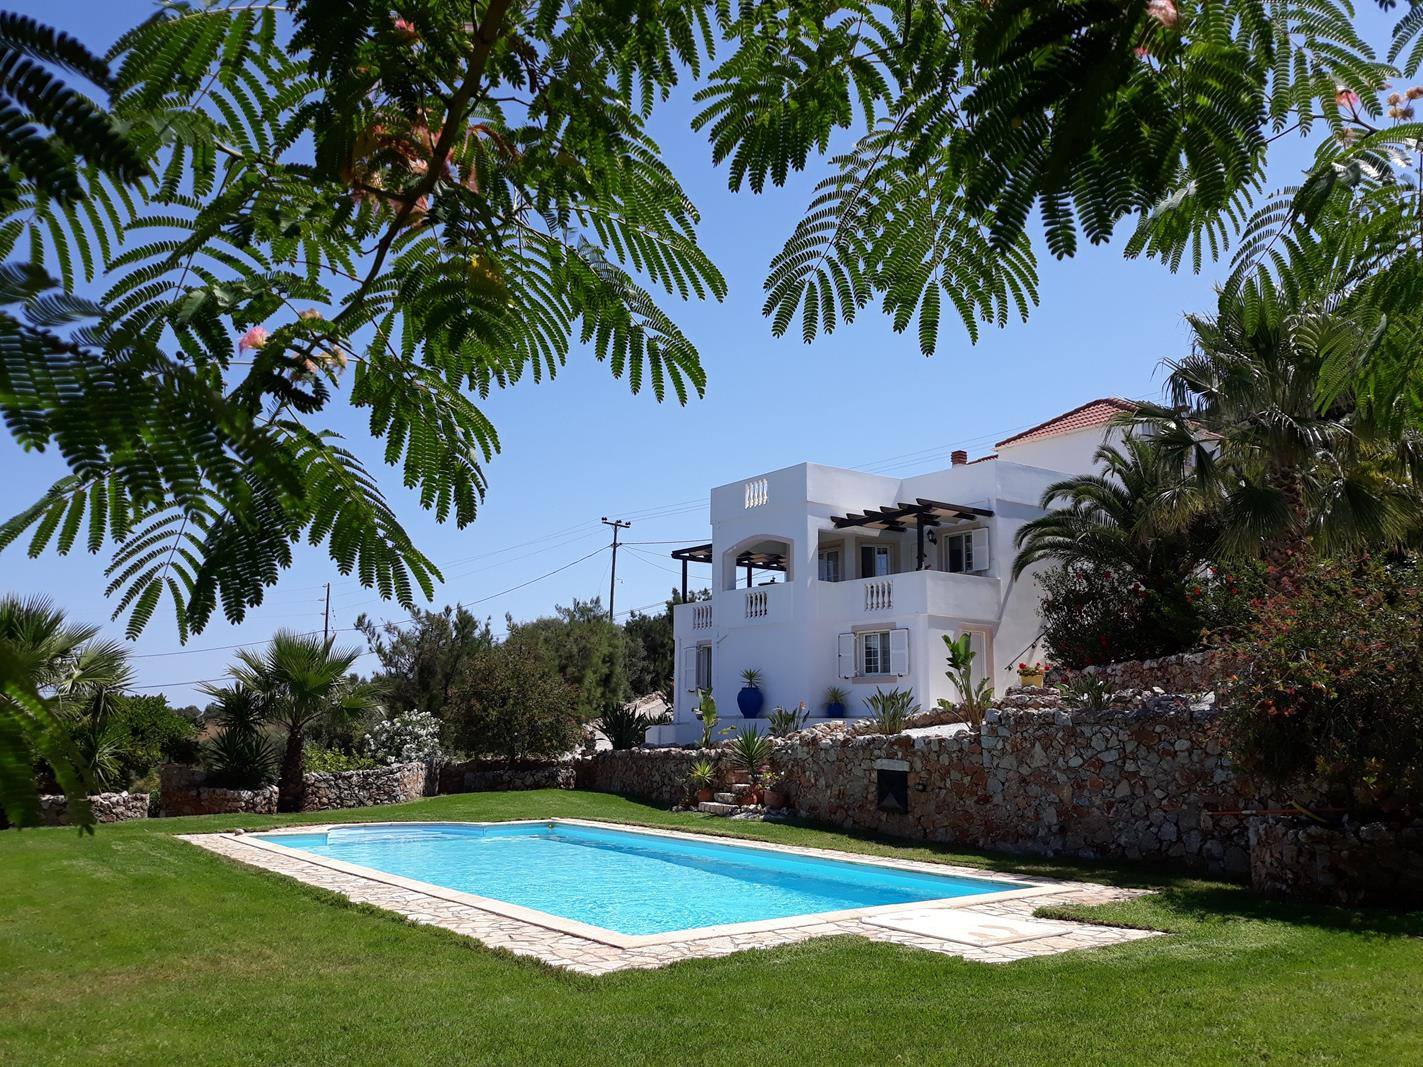 Stunning villa with sea and White Mountains views in Kokkino Chorio